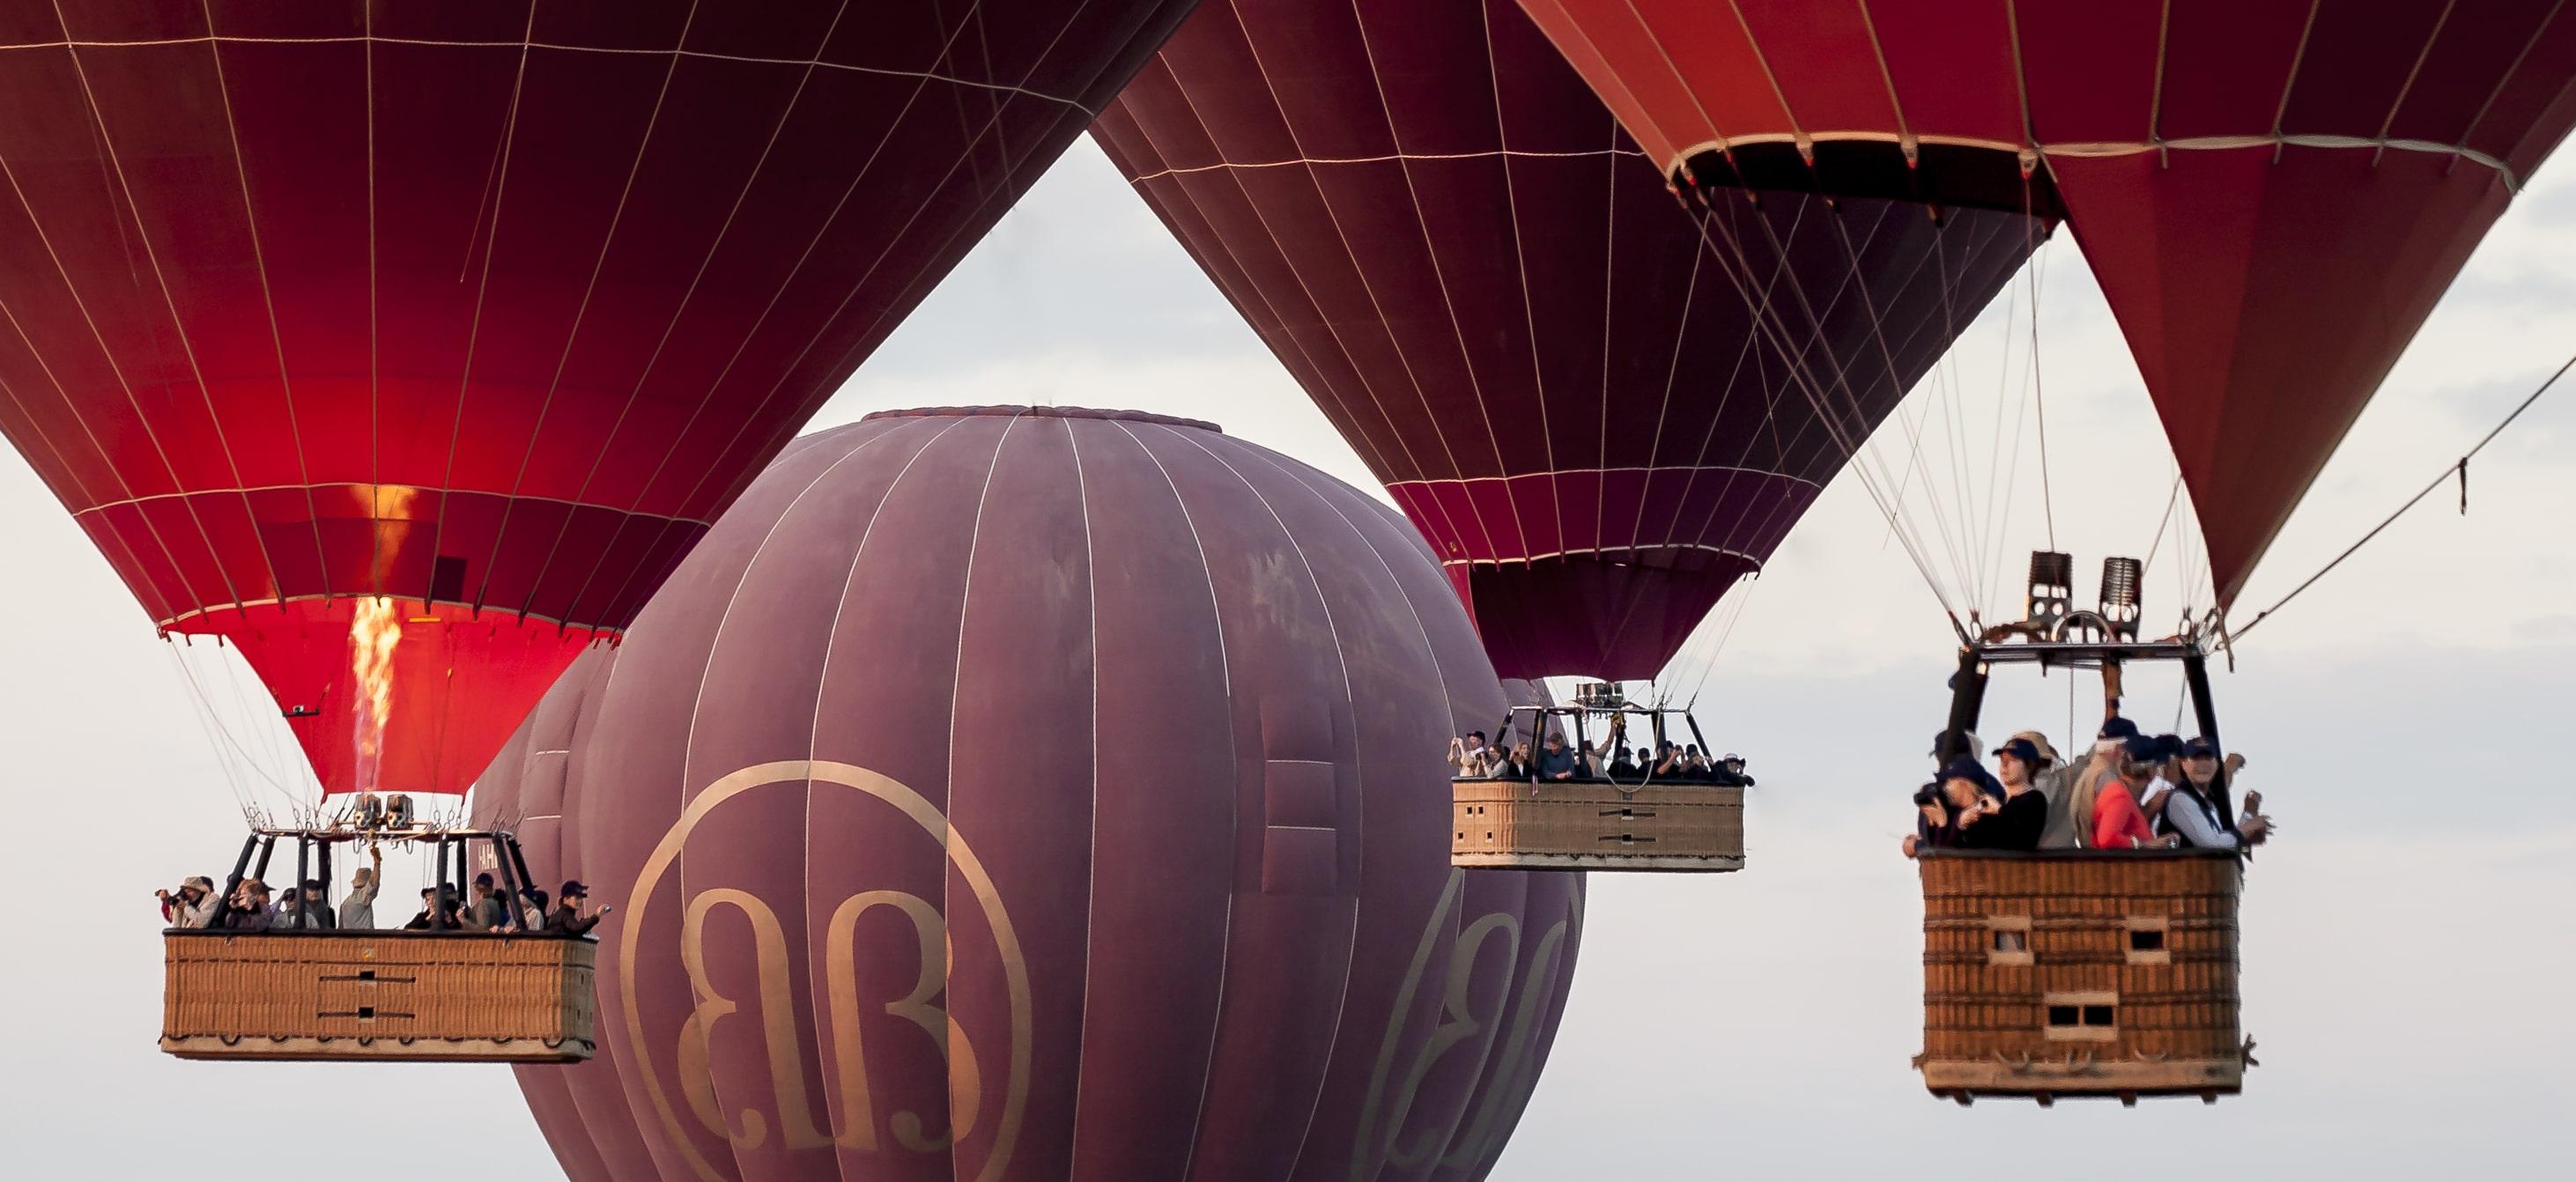 Ballooning in Mandalay